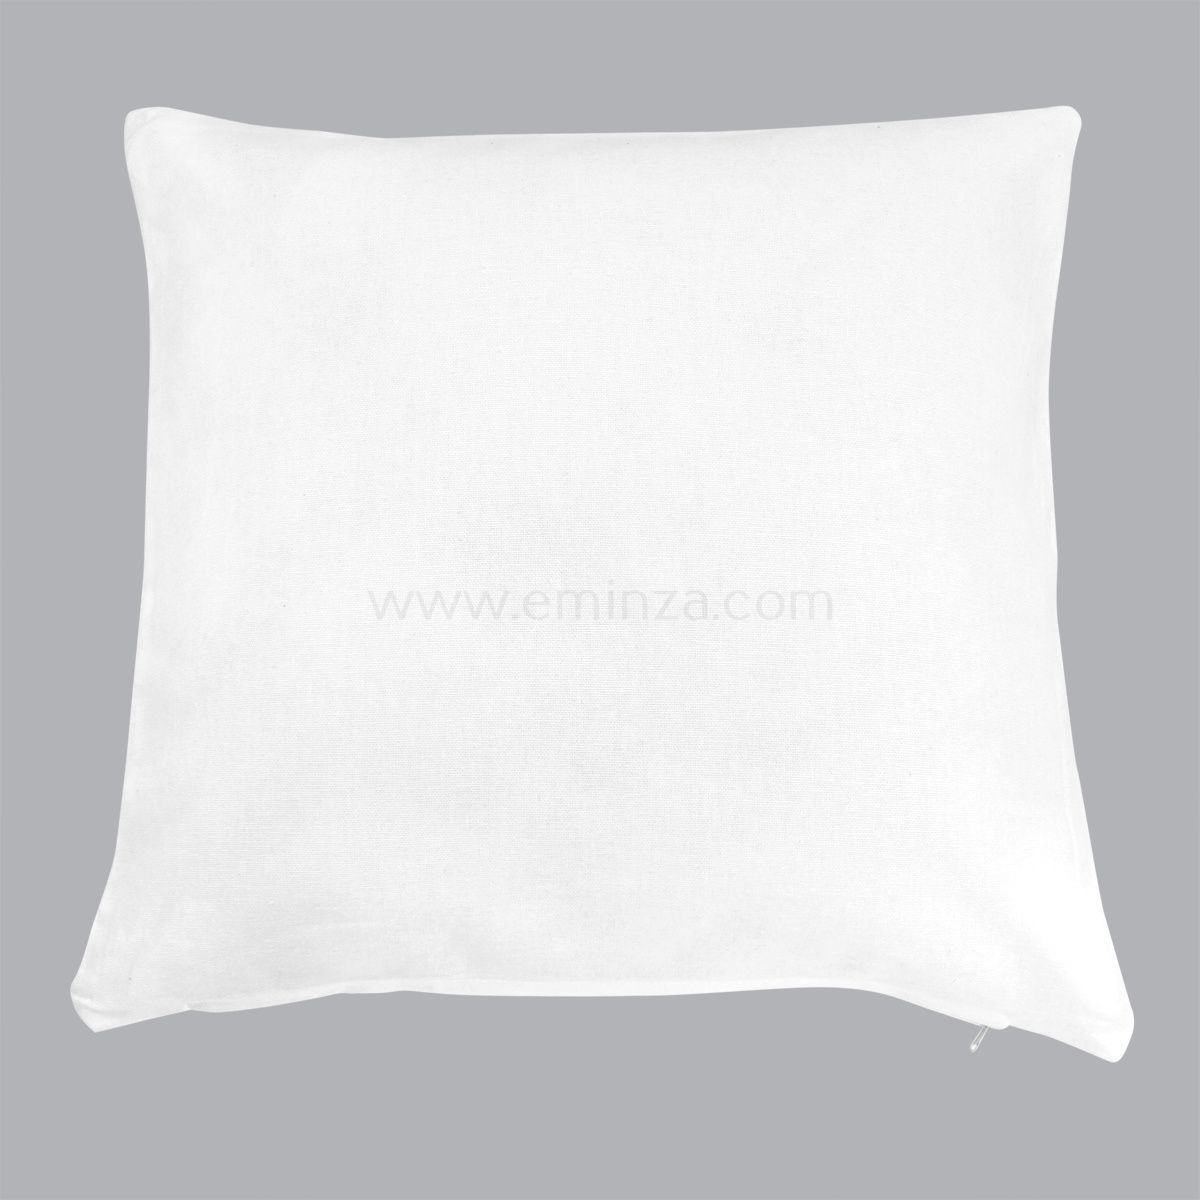 coussin 60 cm etna blanc coussin eminza. Black Bedroom Furniture Sets. Home Design Ideas